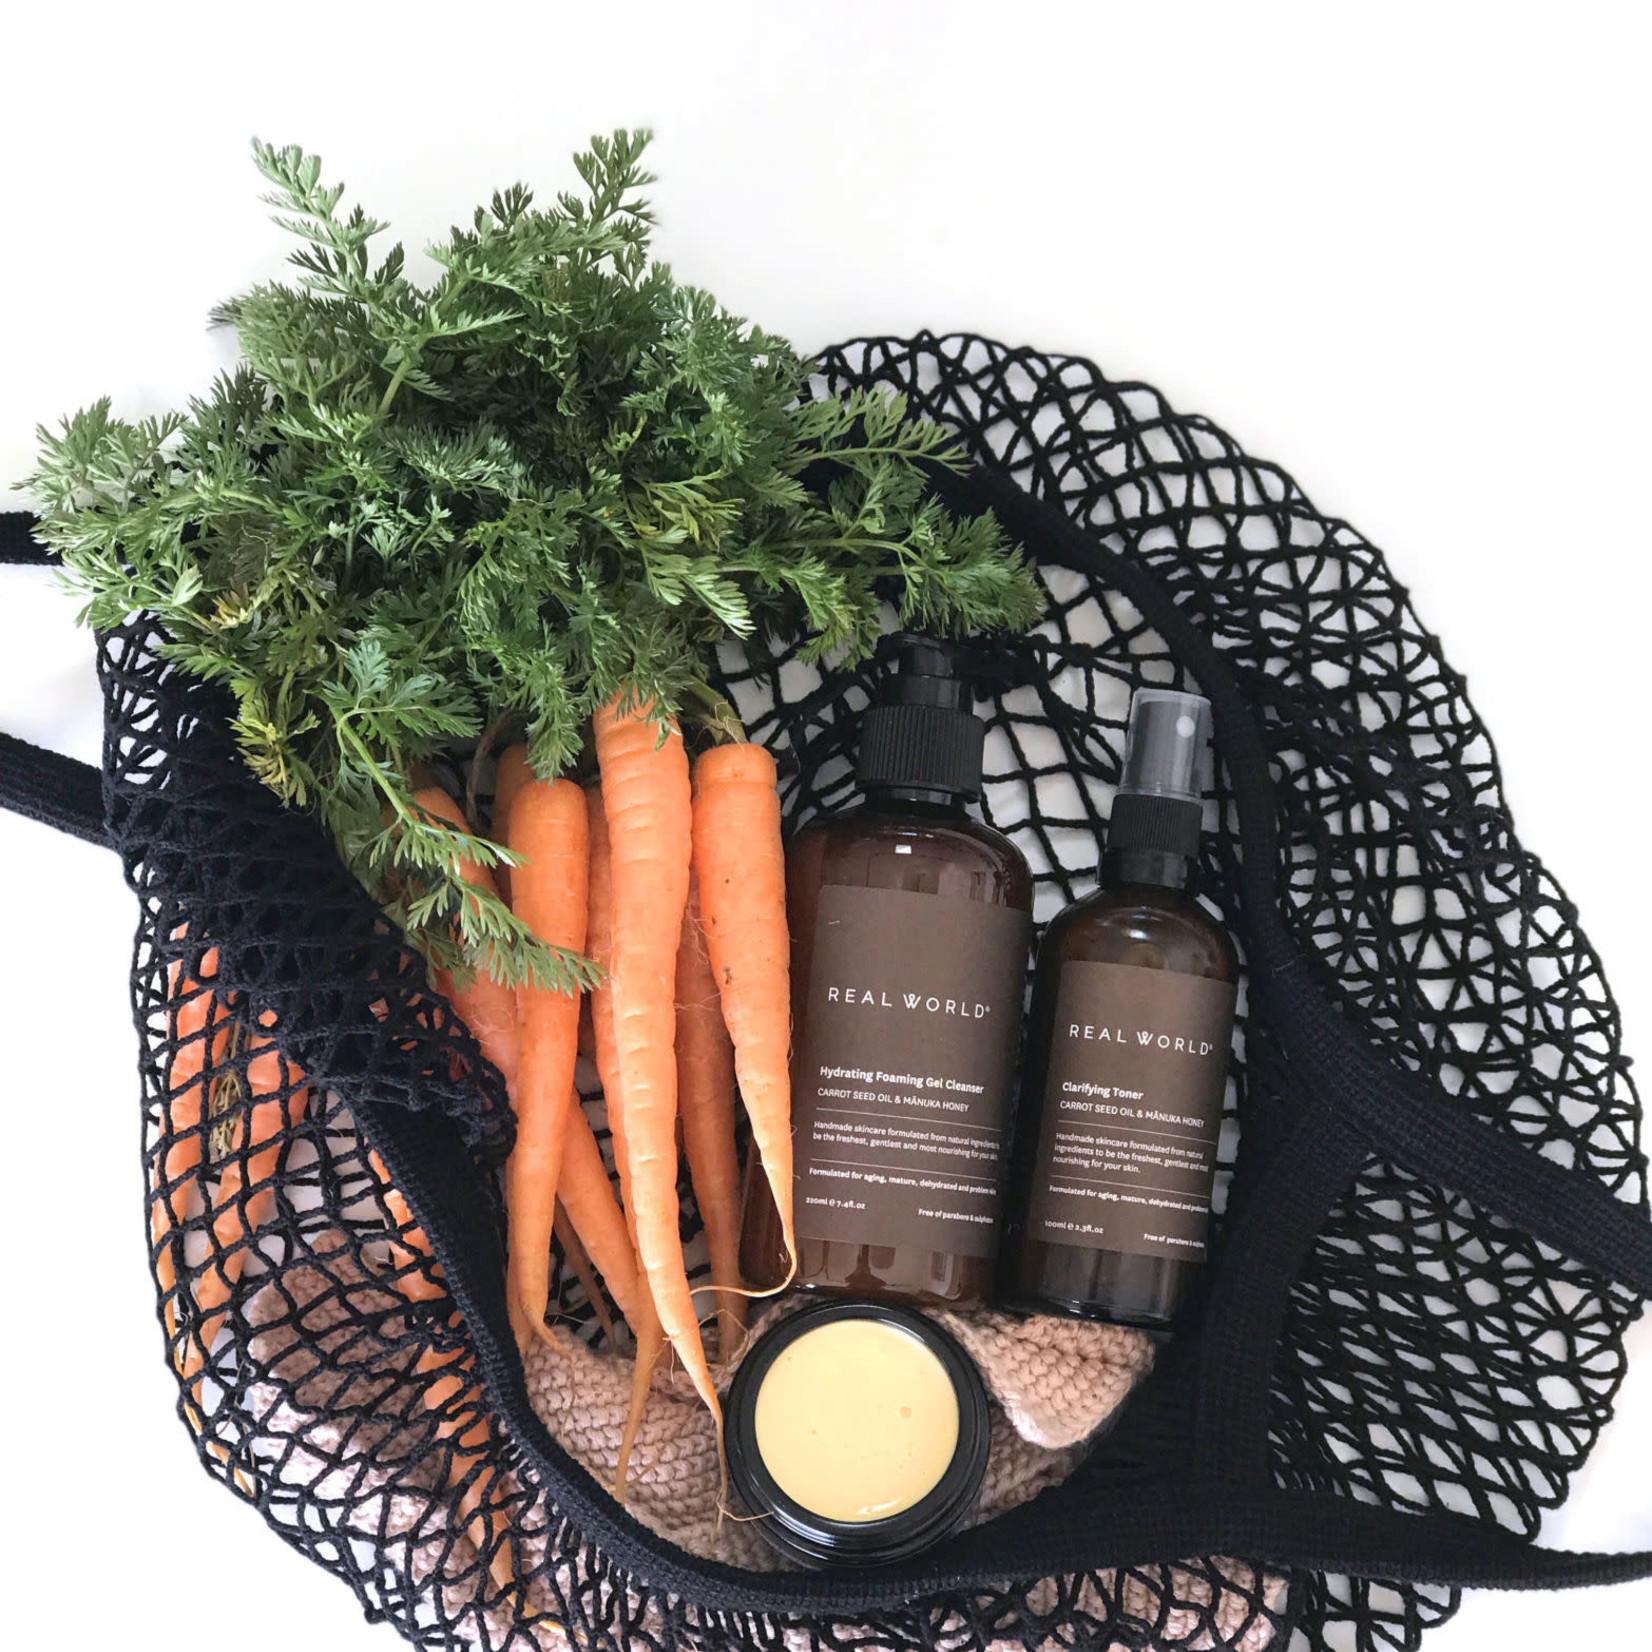 Real World Carrot Seed Oil & Manuka Honey Face Cream